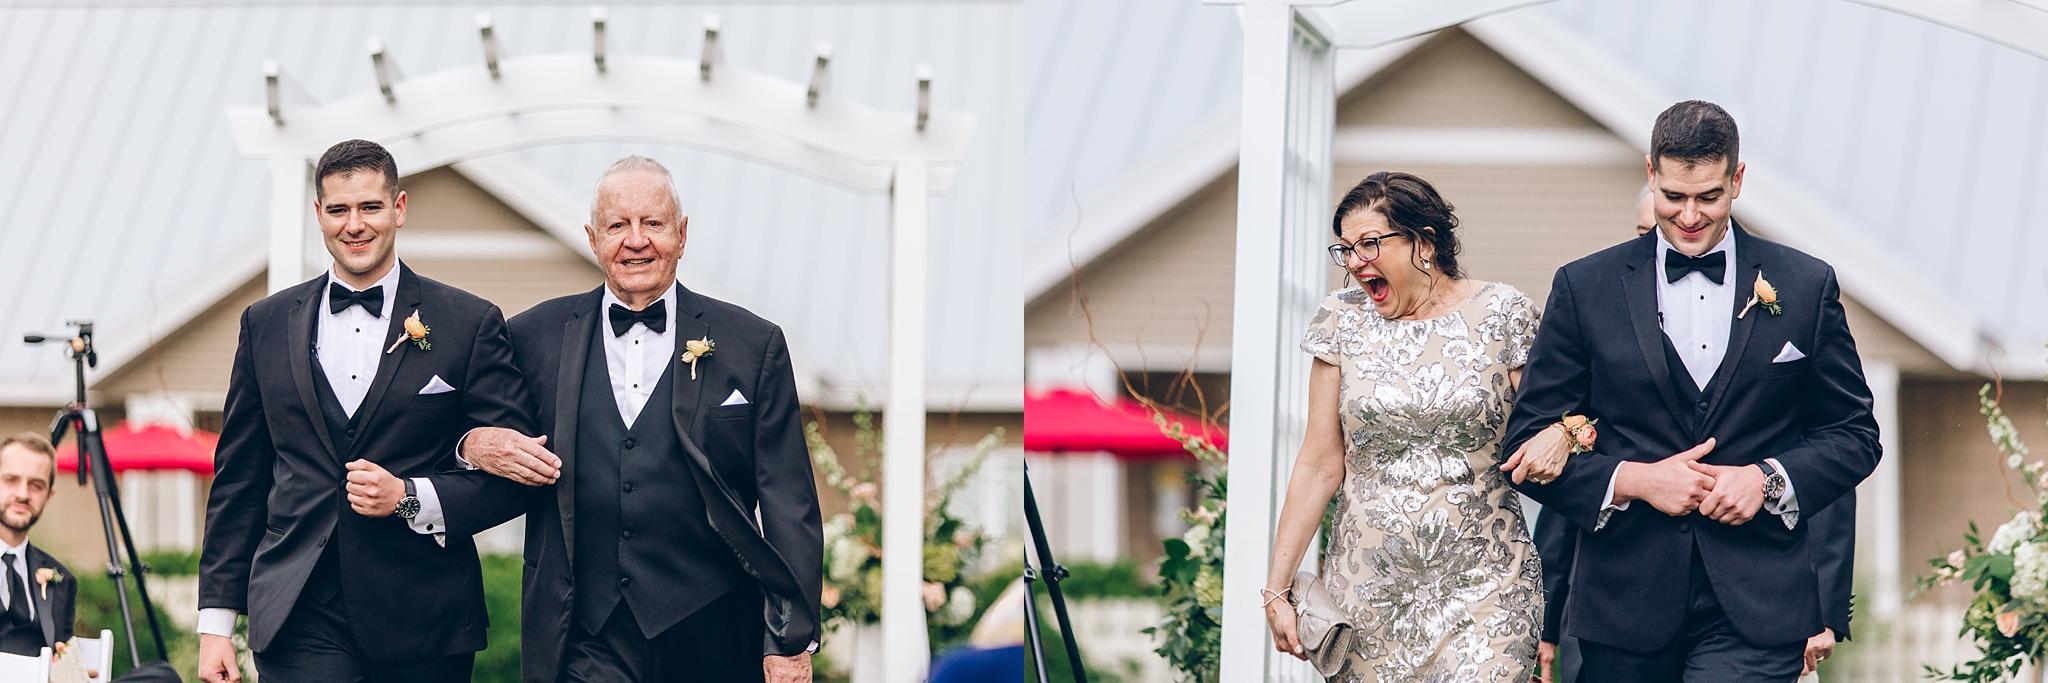 baker-lofts-holland-michigan-wedding-photographer_0351.jpg